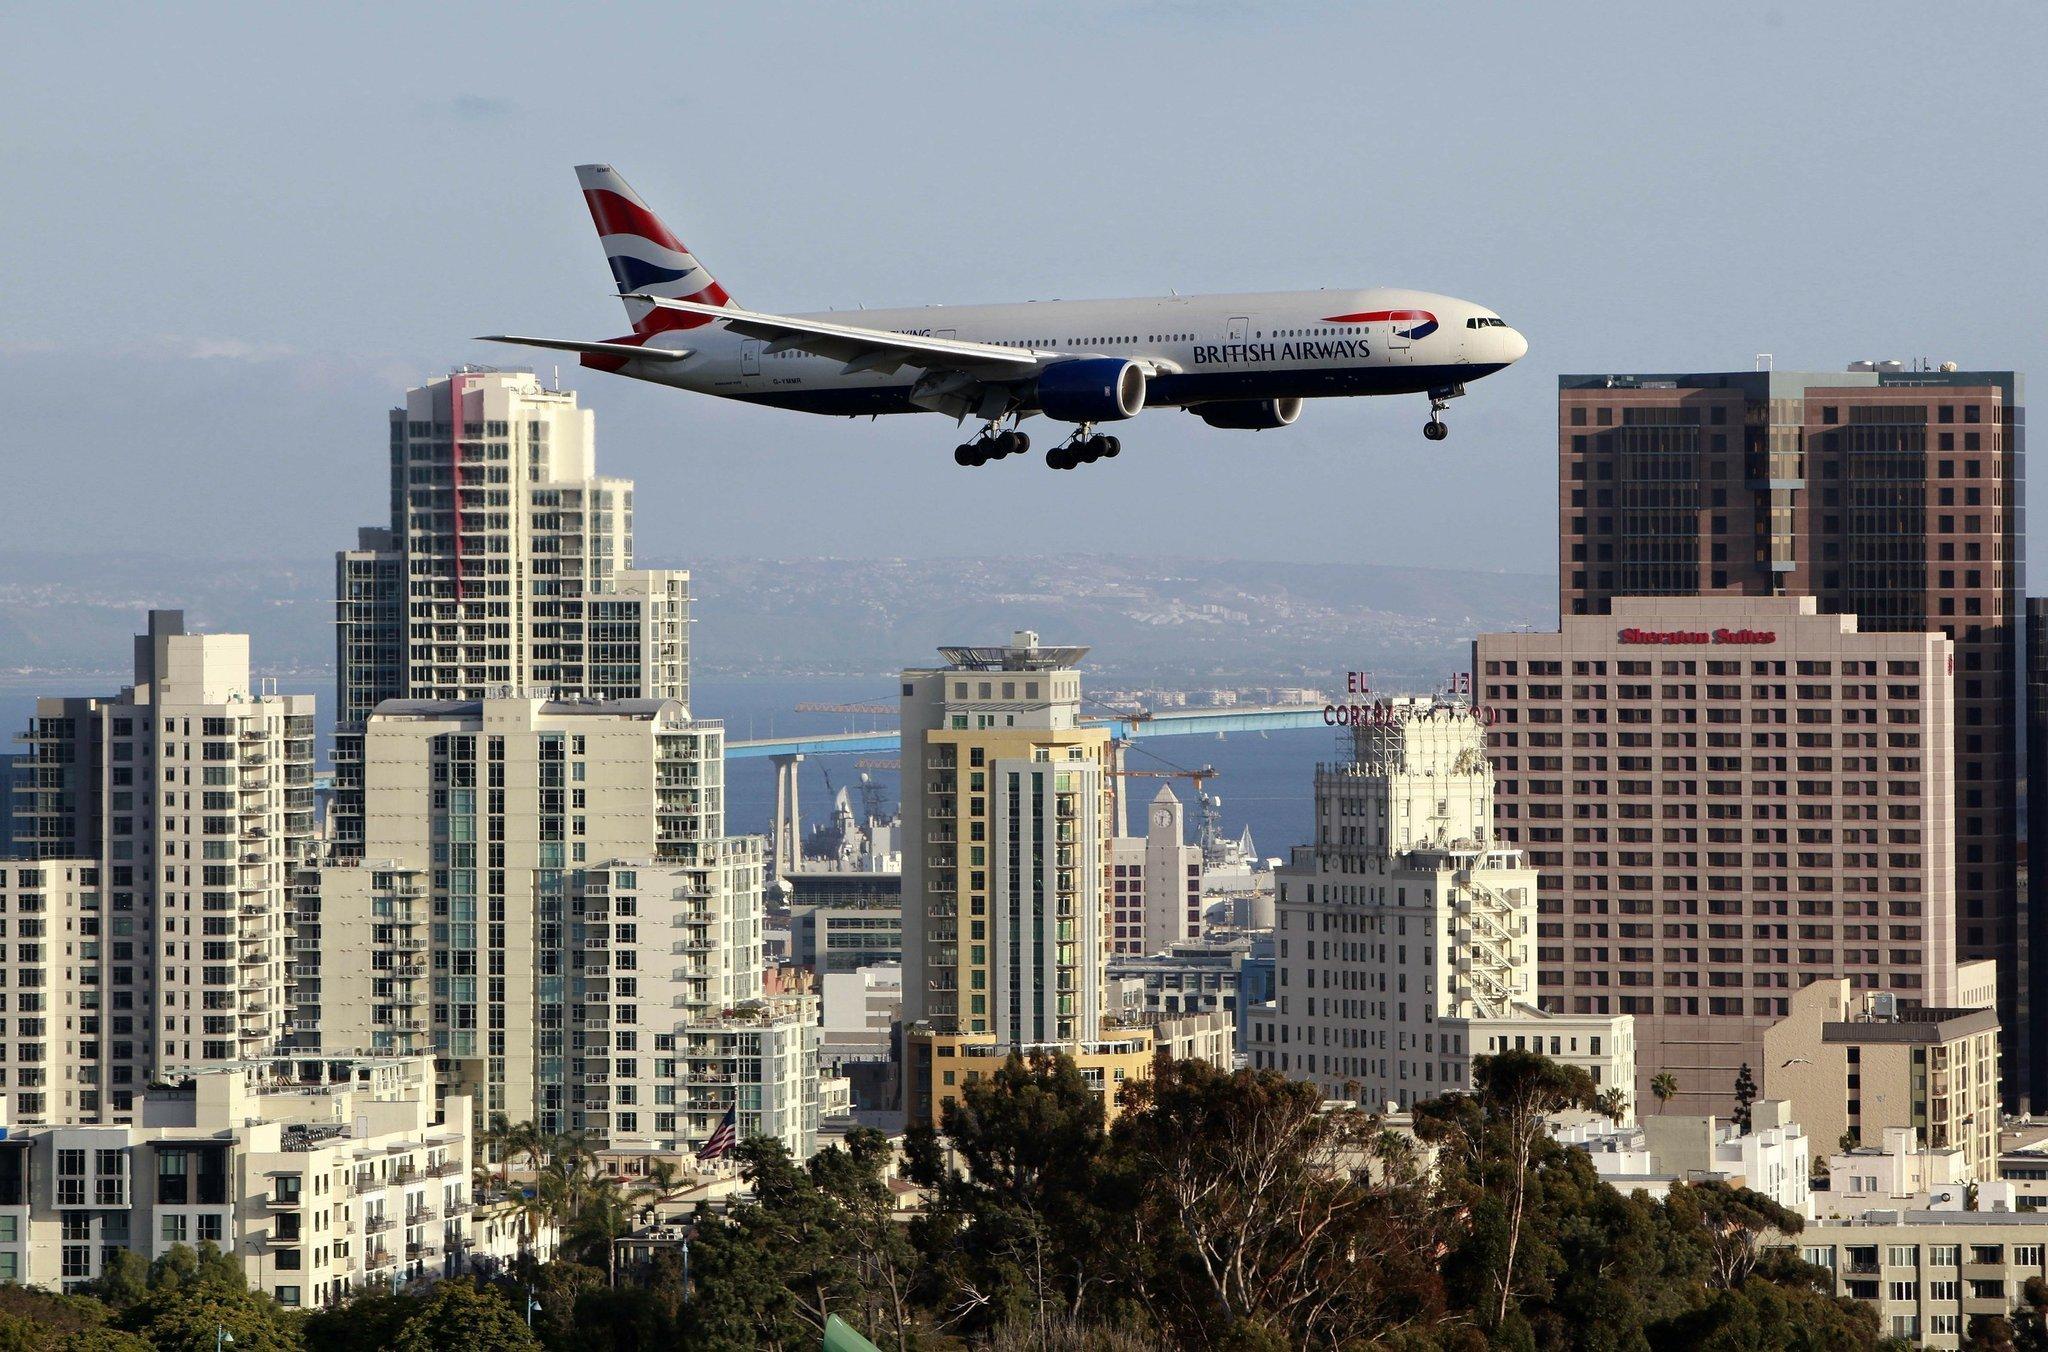 how safe is san diego airport? - the san diego union-tribune